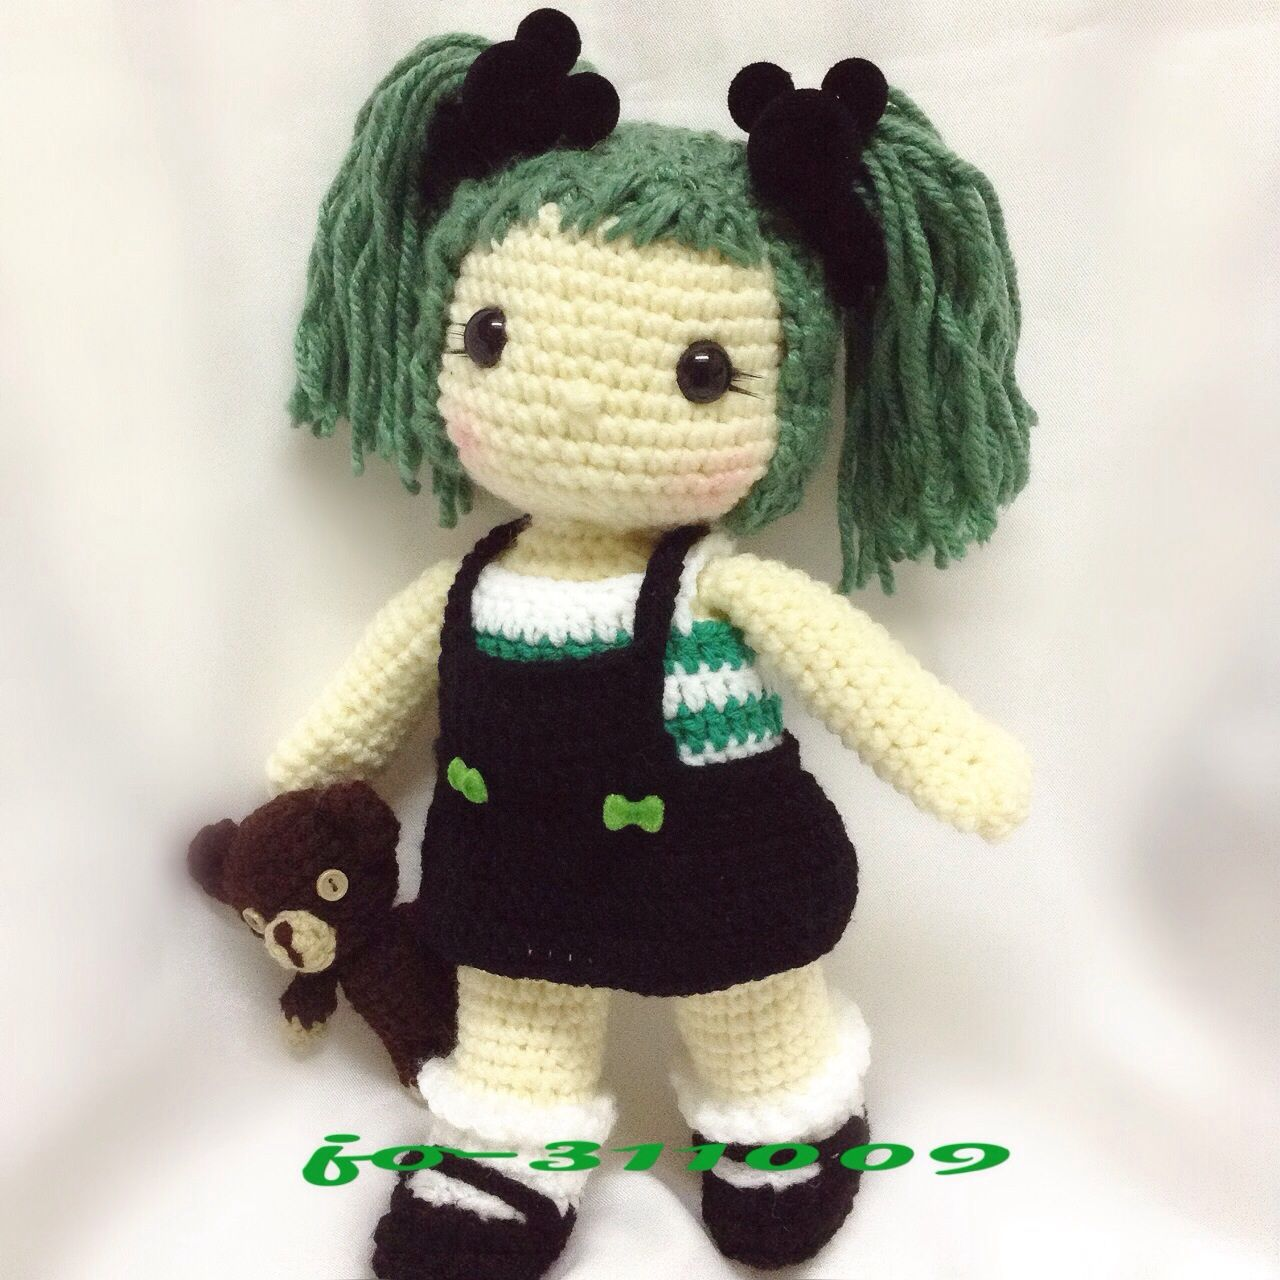 Crochetdolls Knit and Crochet Pinterest